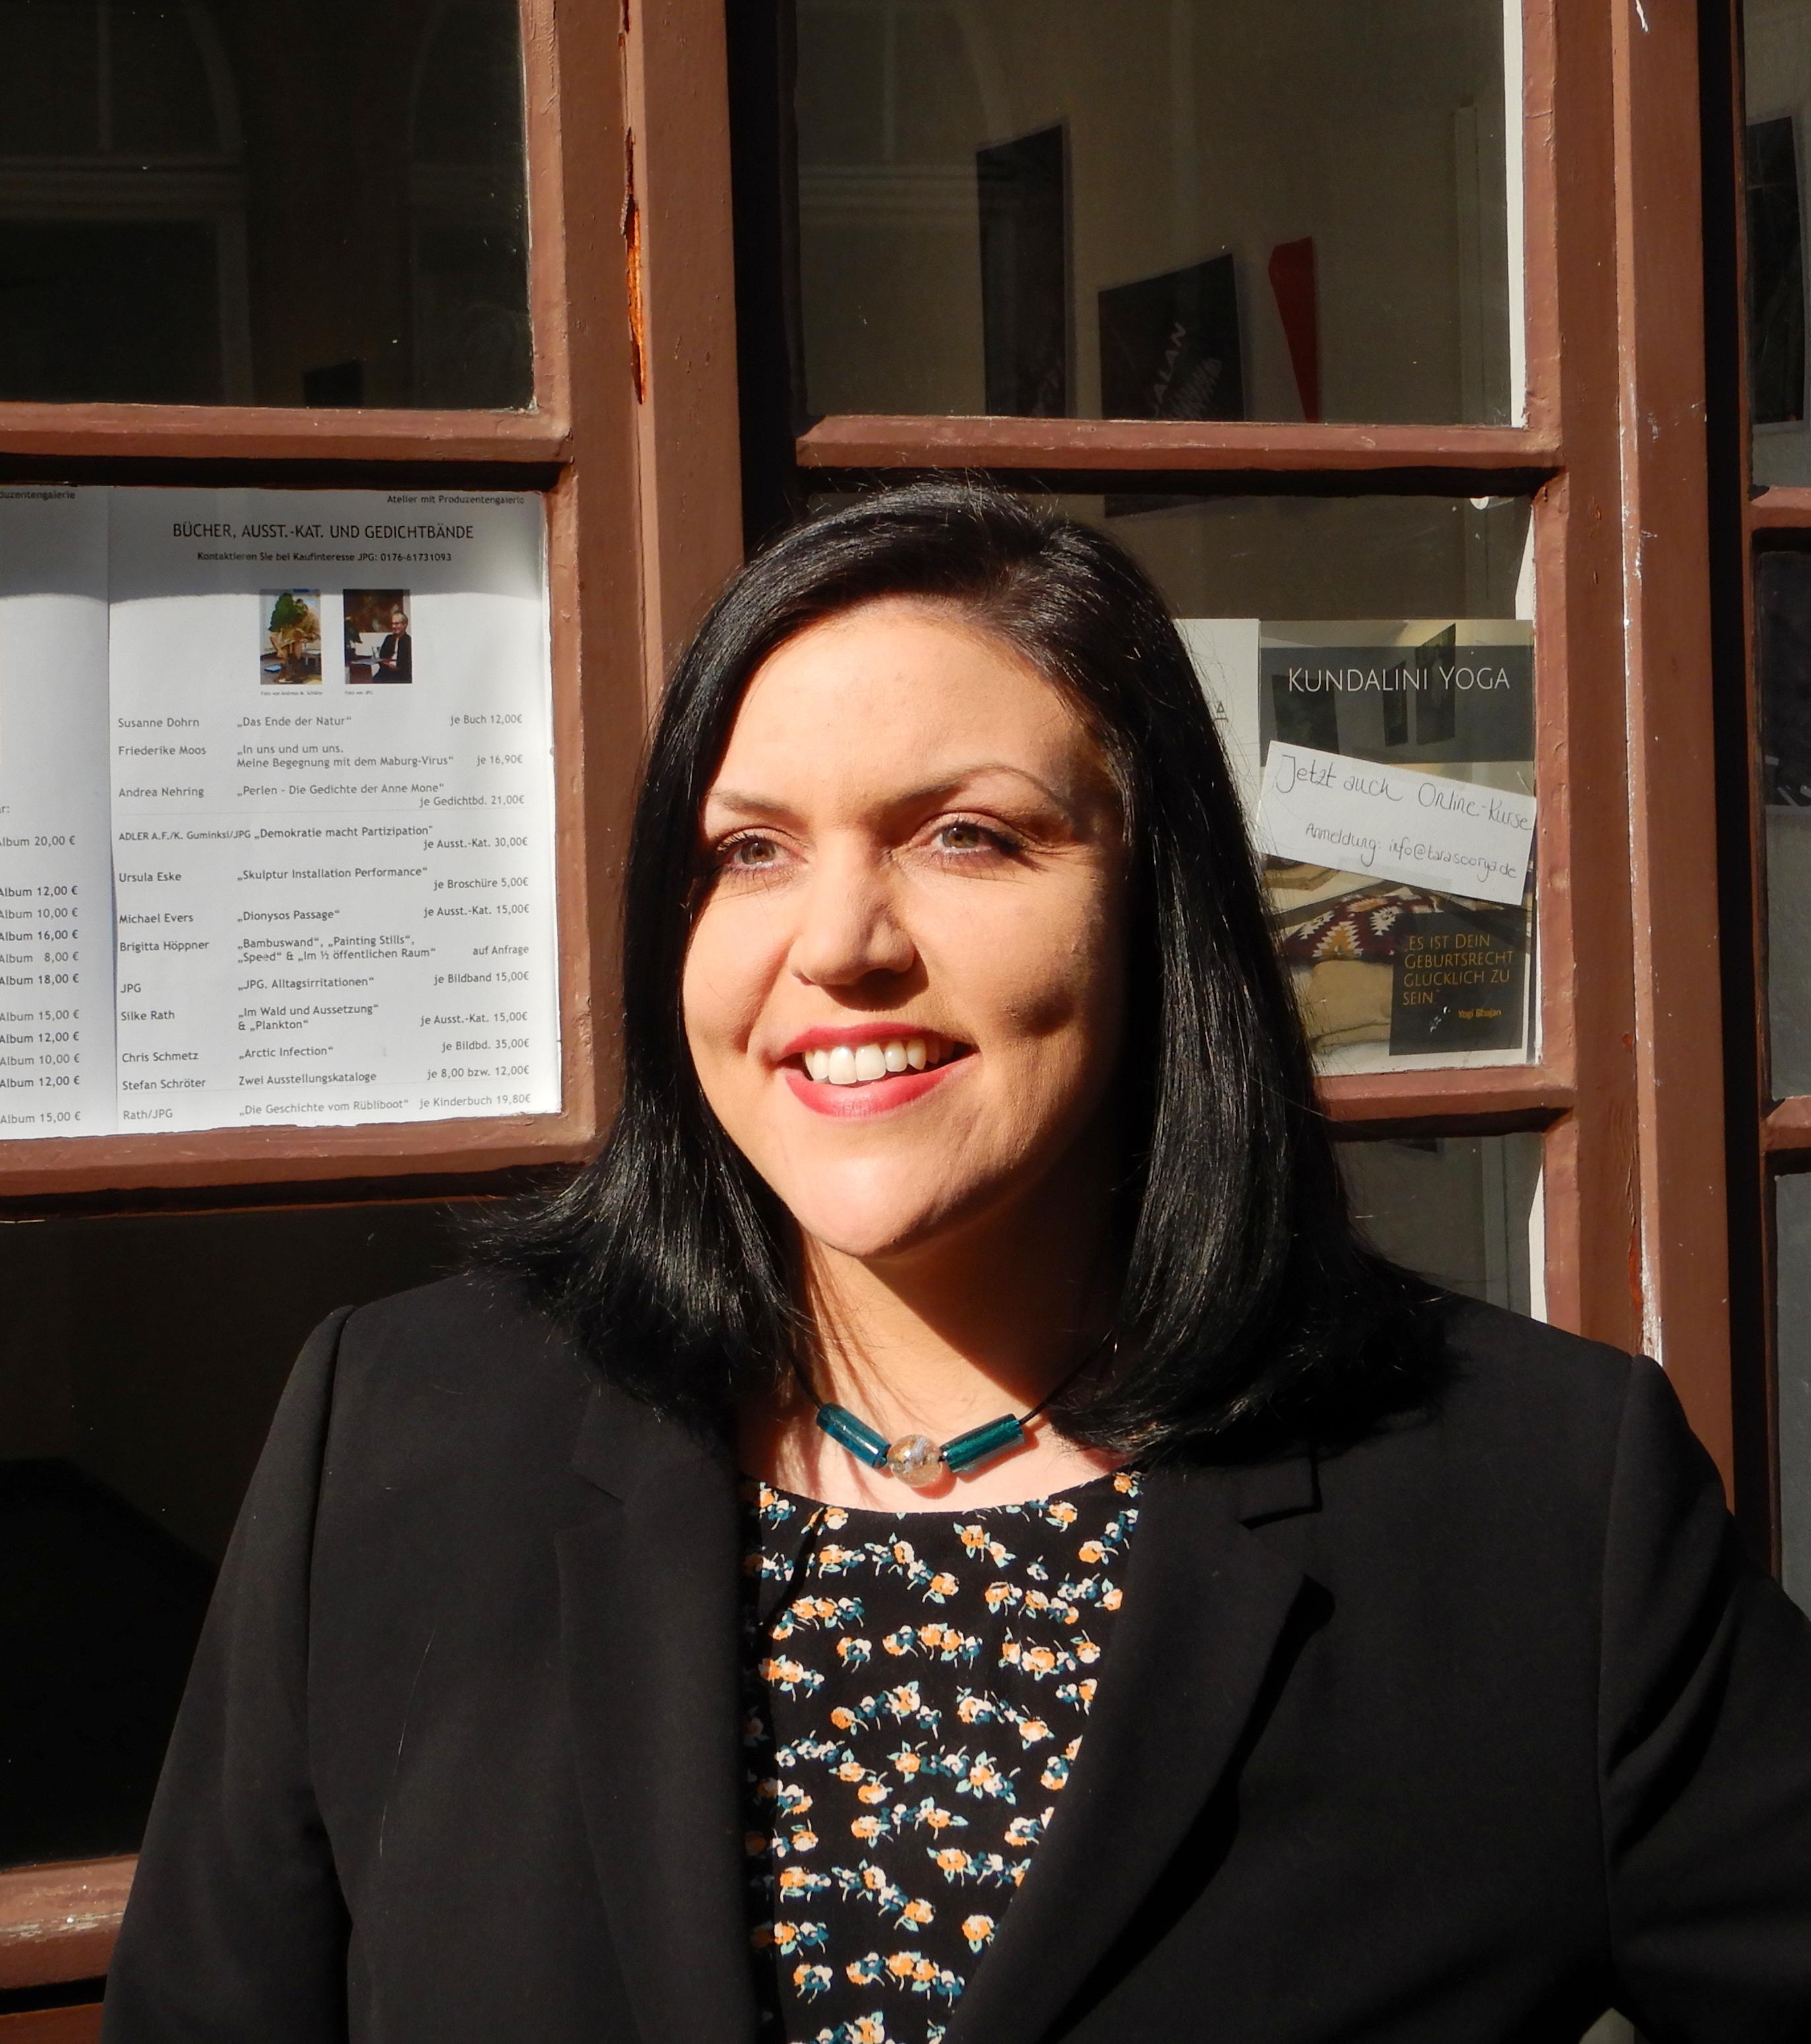 Jessica Petraccaro-Goertsches